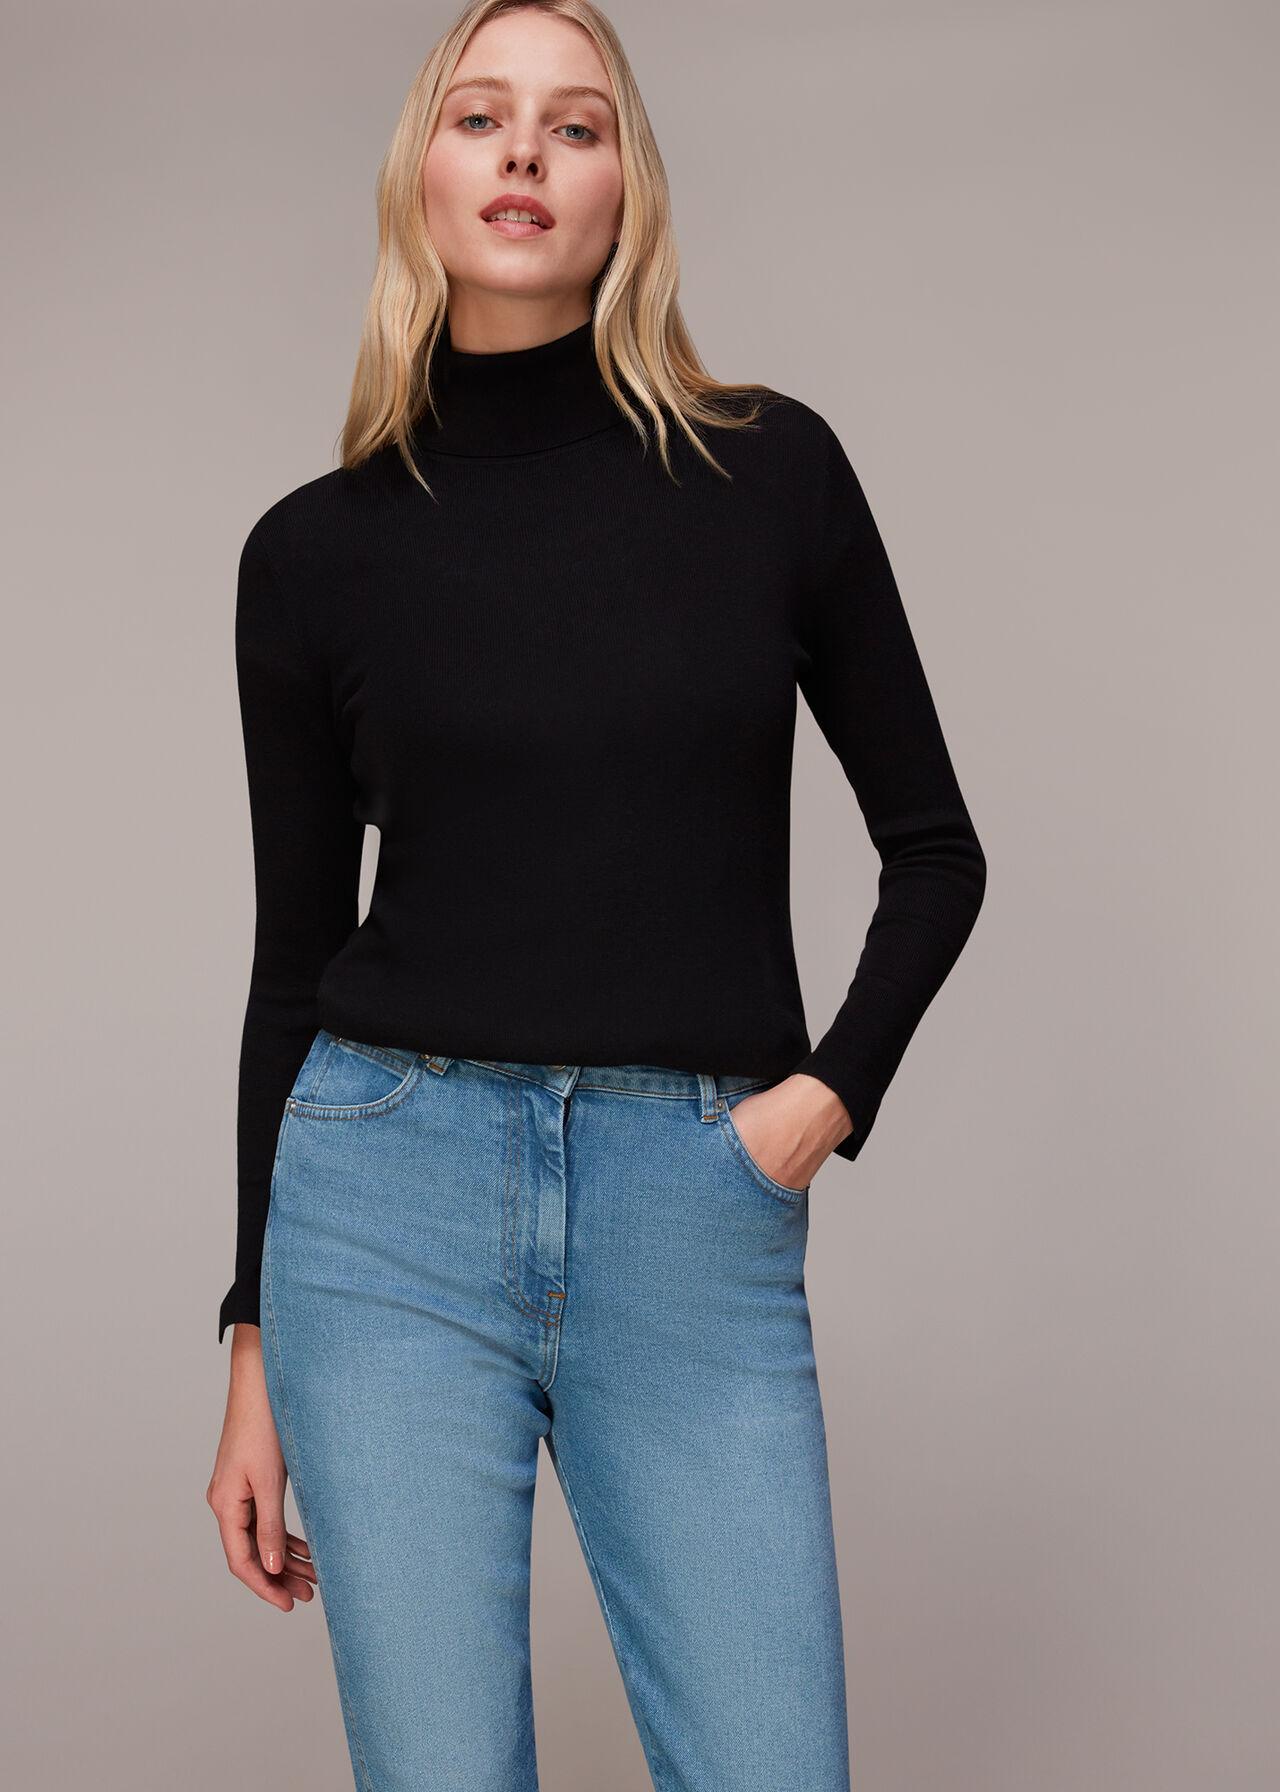 Authentic Slim Frayed Jean